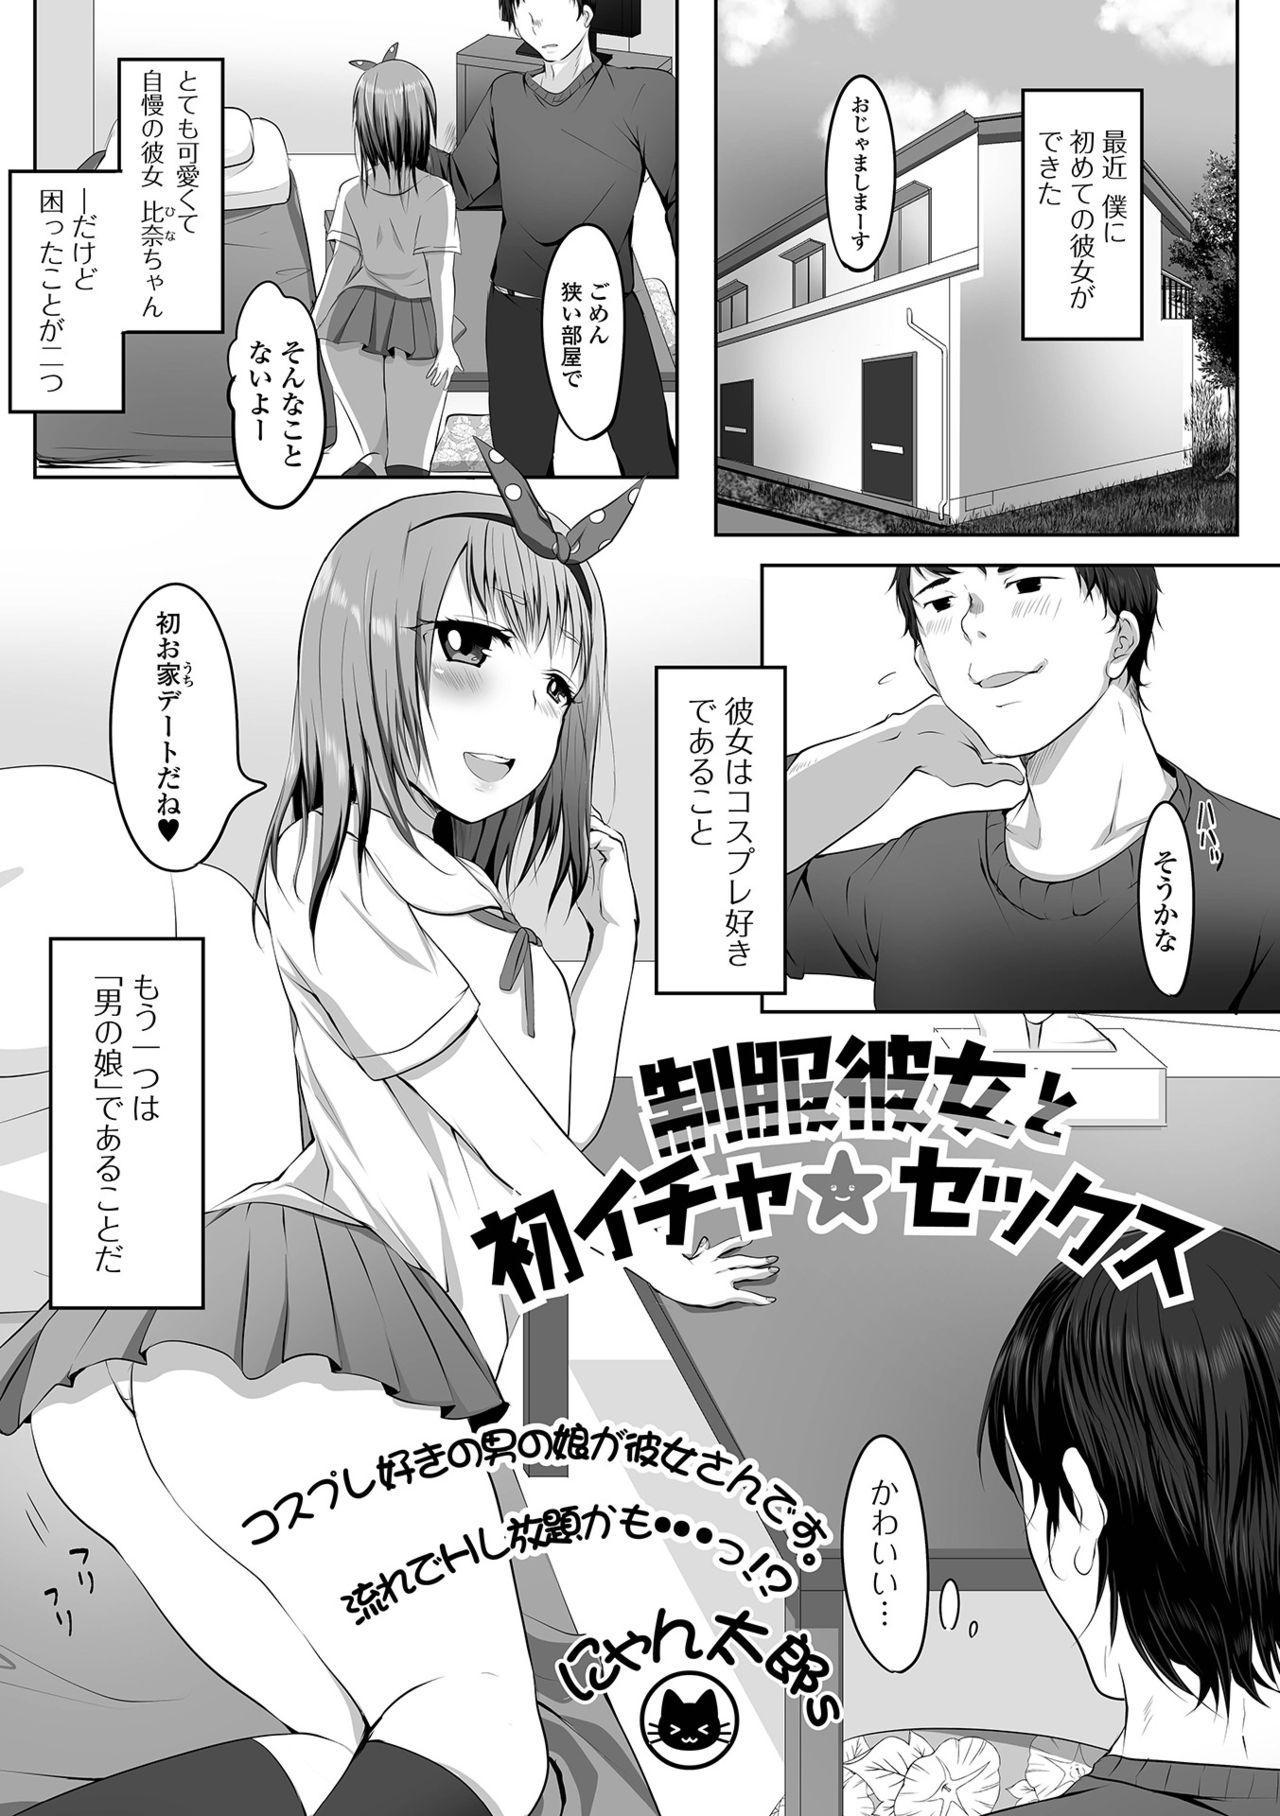 Gekkan Web Otoko no Ko-llection! S Vol. 64 50